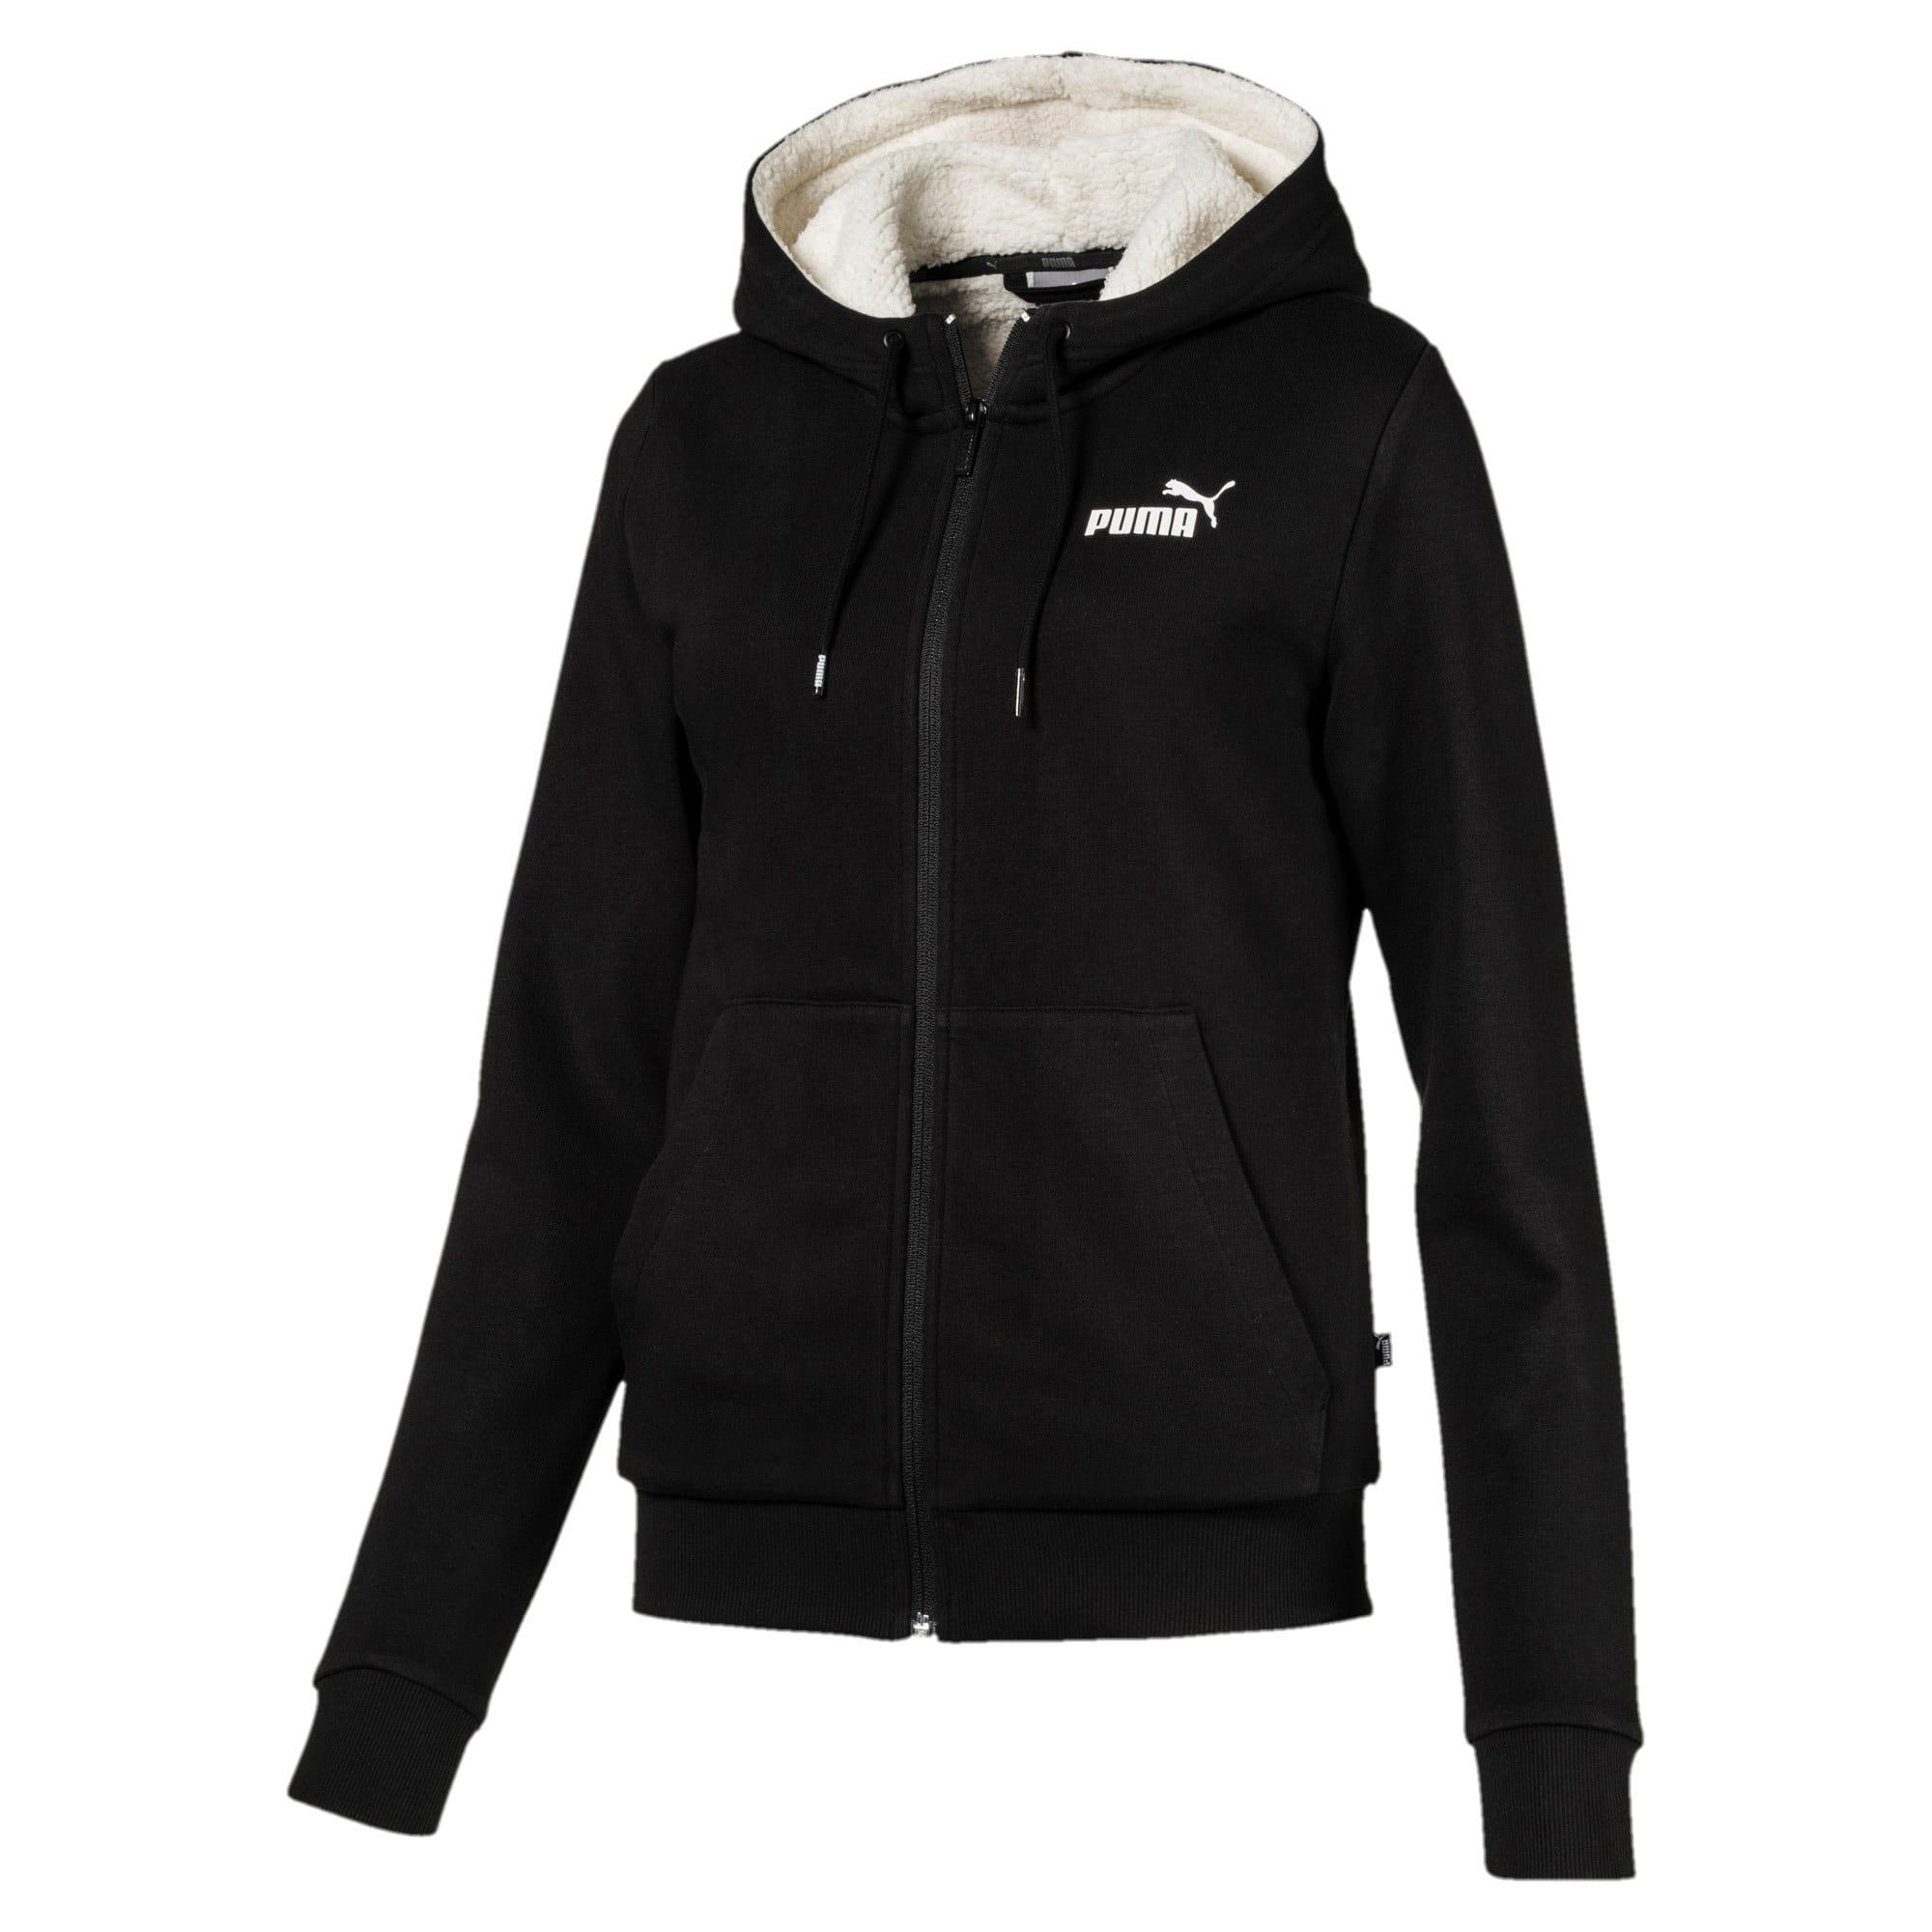 Thumbnail 4 of Essentials + Sherpa Women's Hooded Jacket, Cotton Black, medium